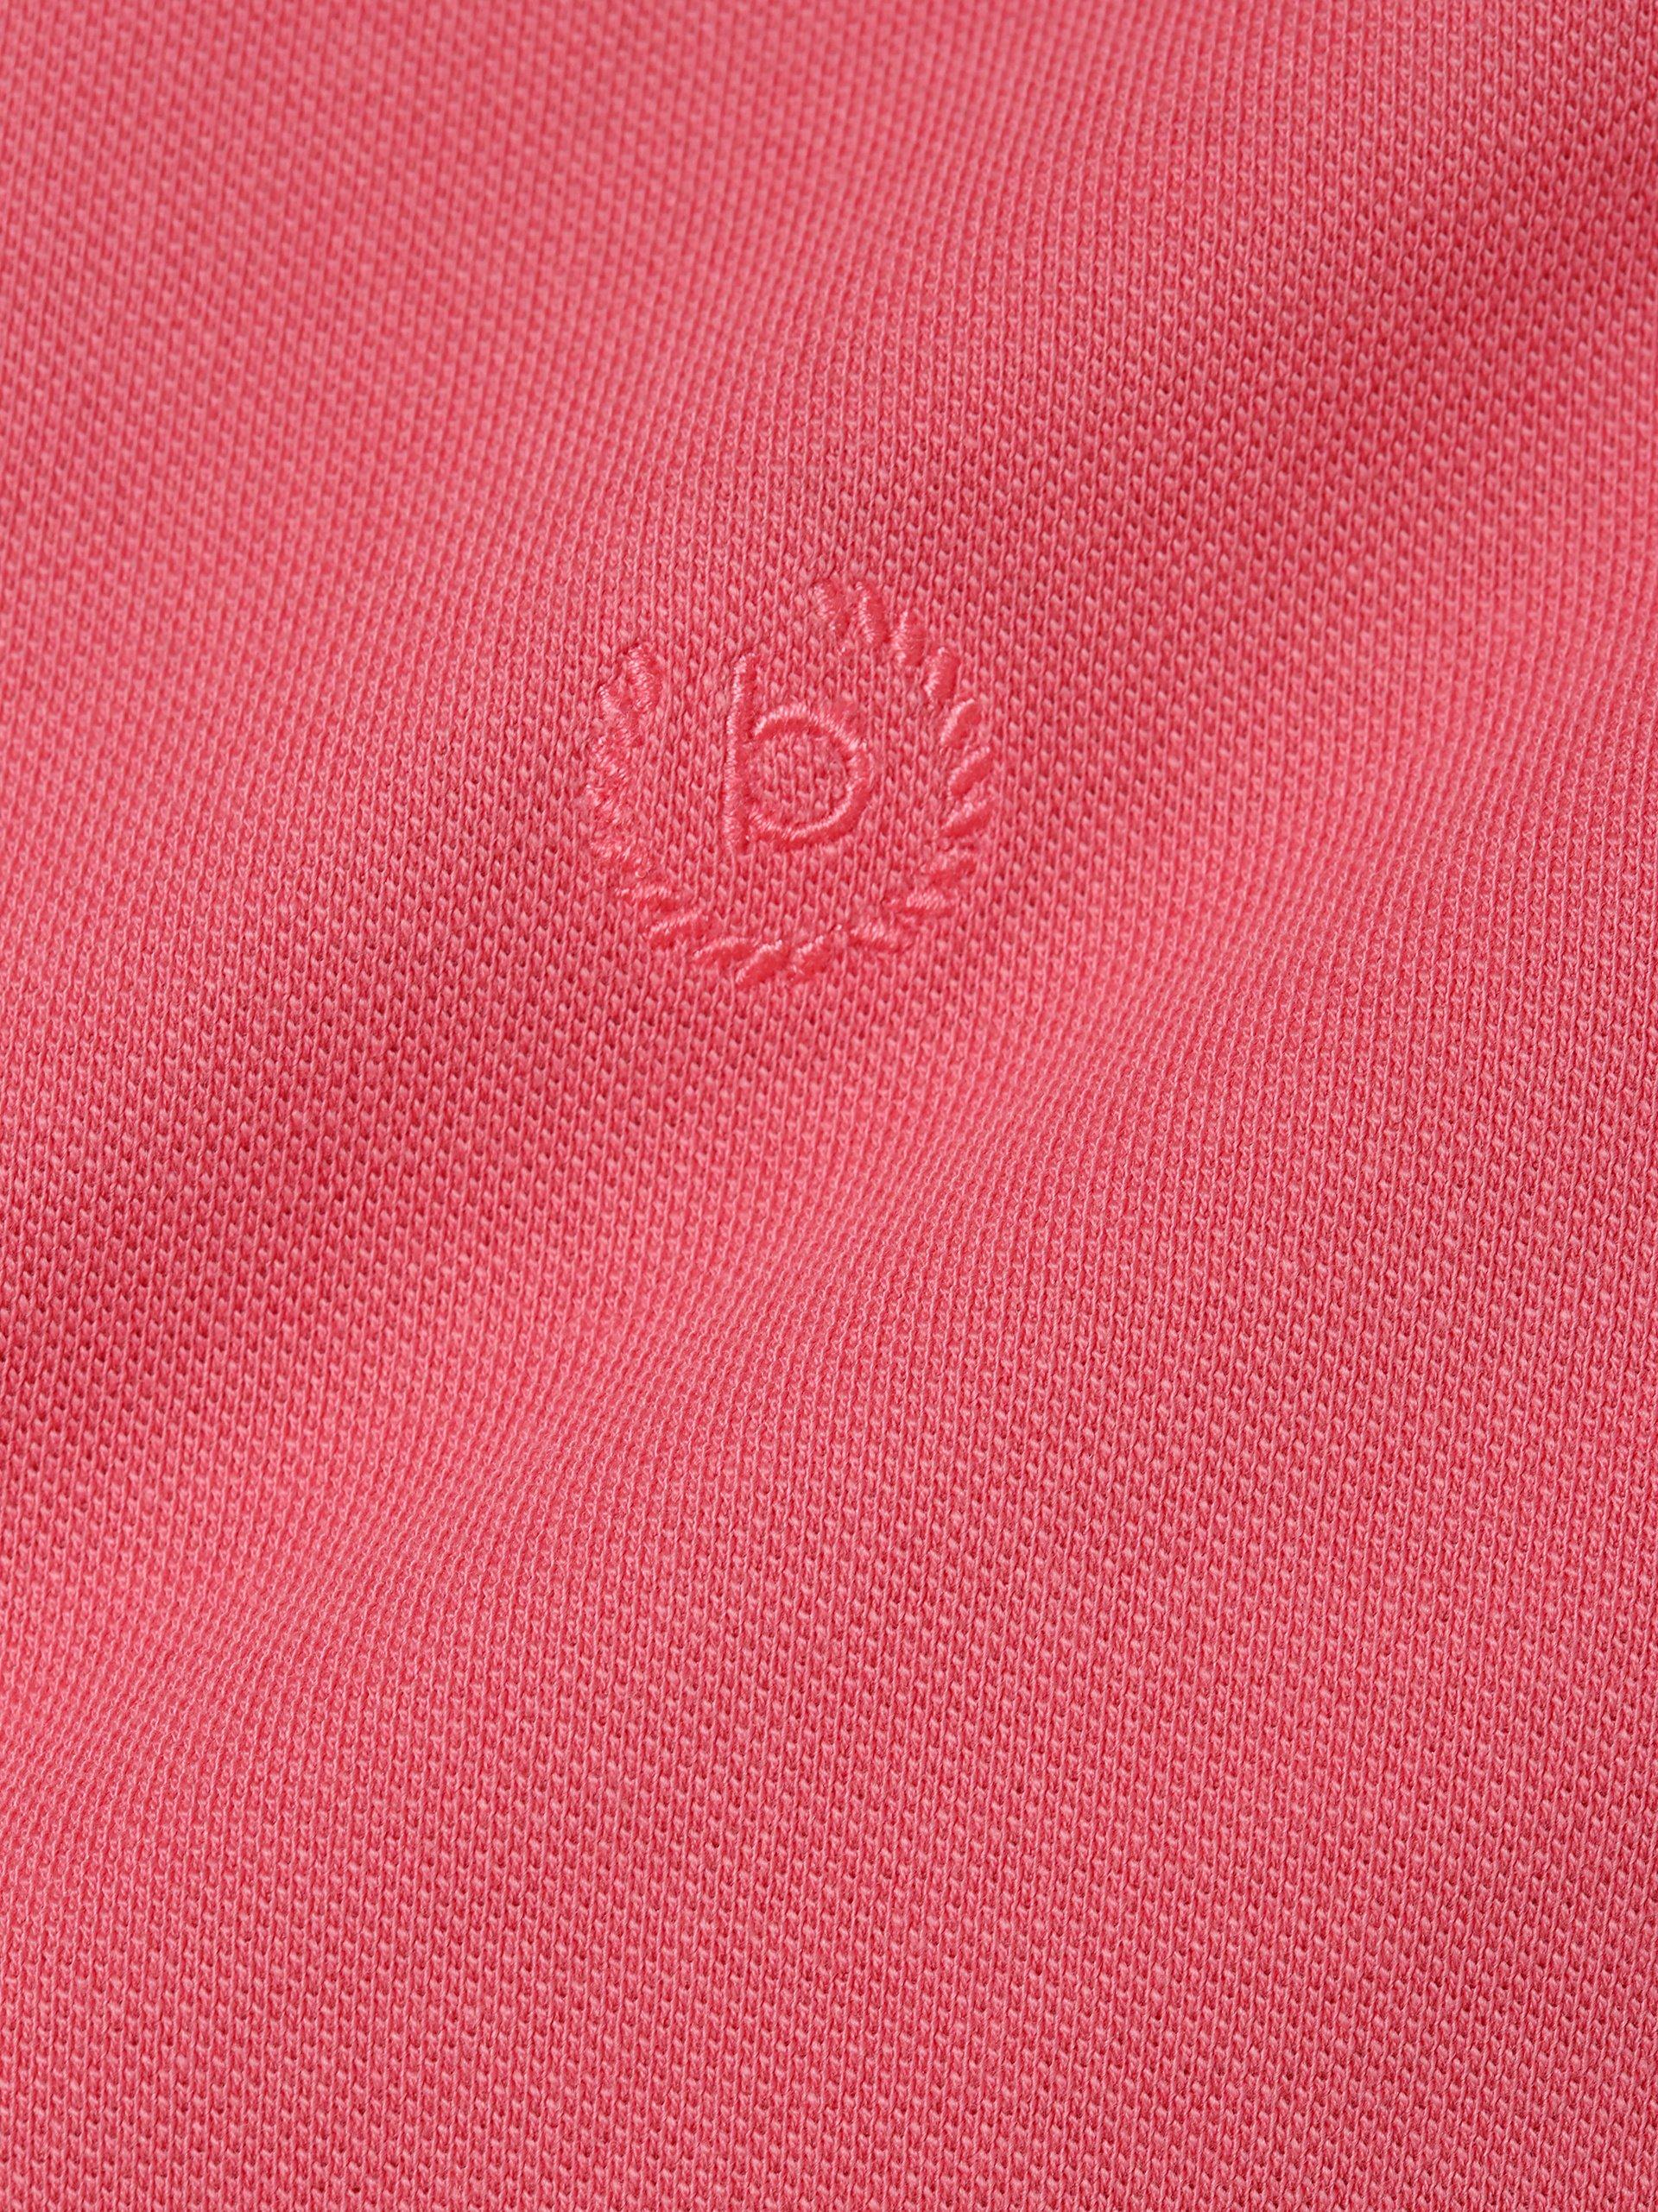 Bugatti Męska koszulka polo